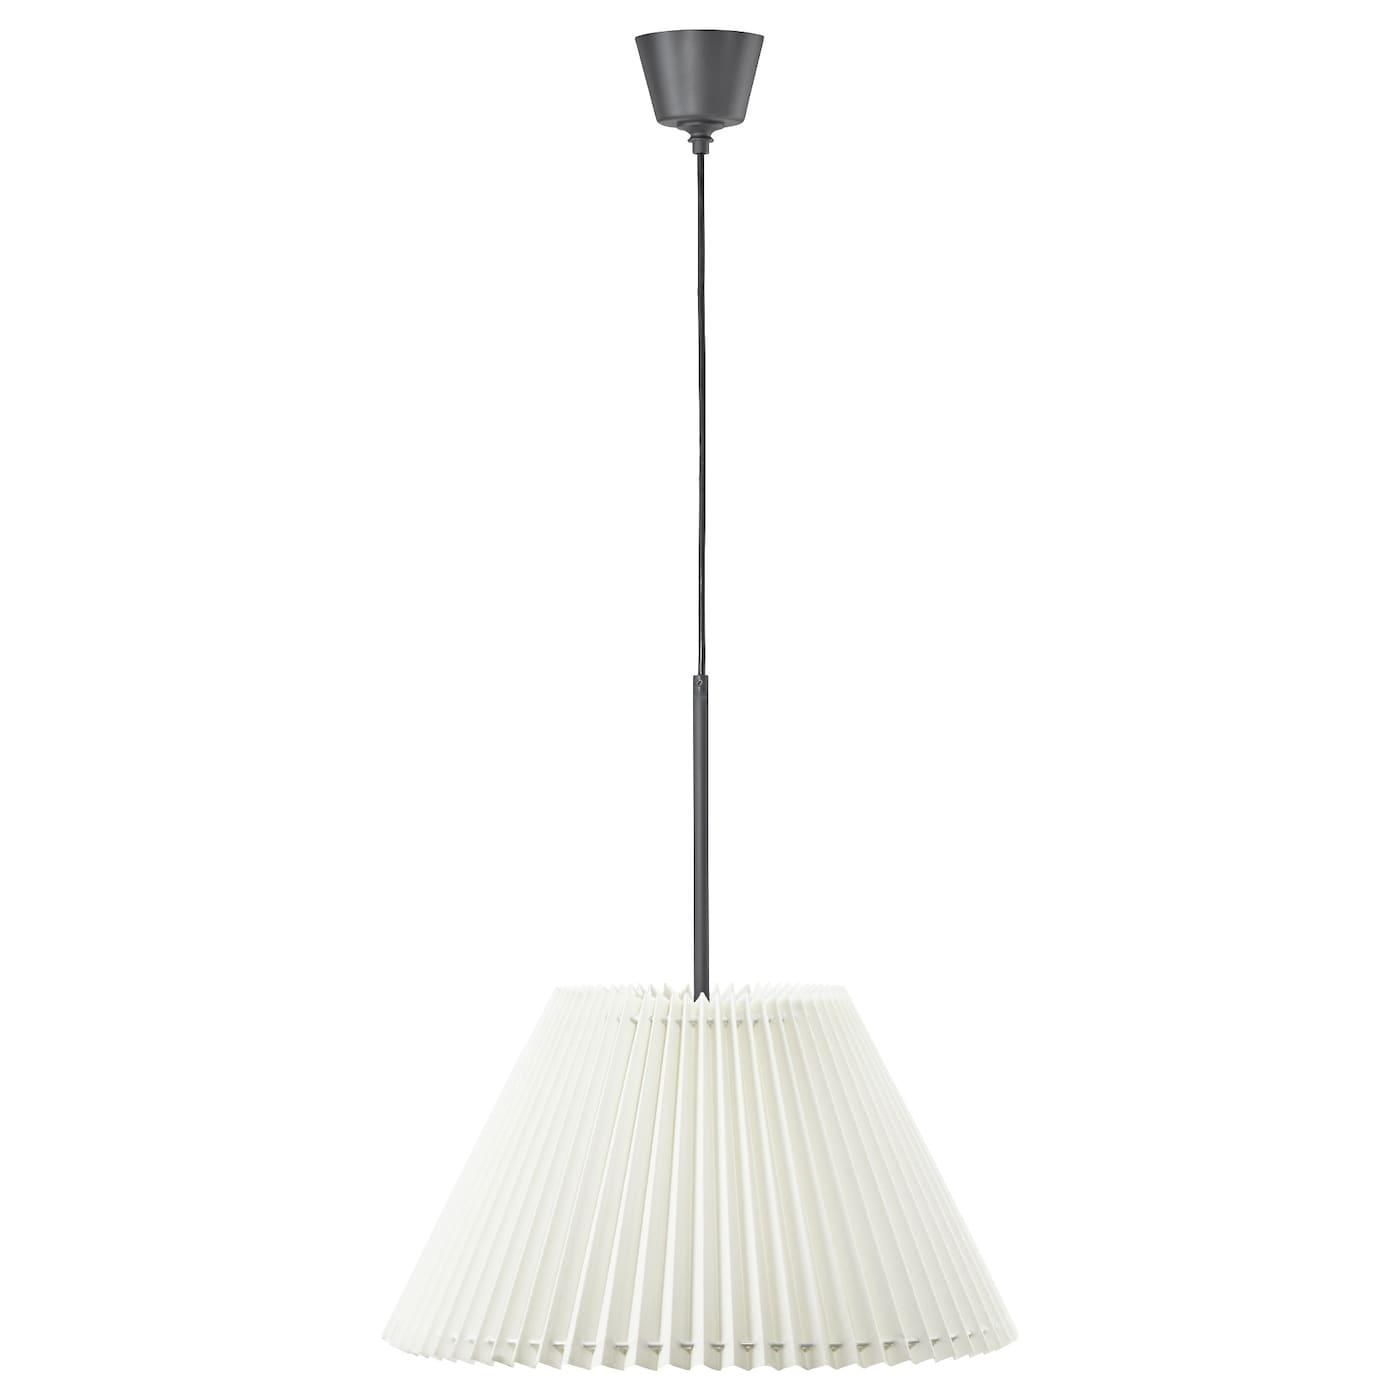 Pendant Lamps & Chandeliers